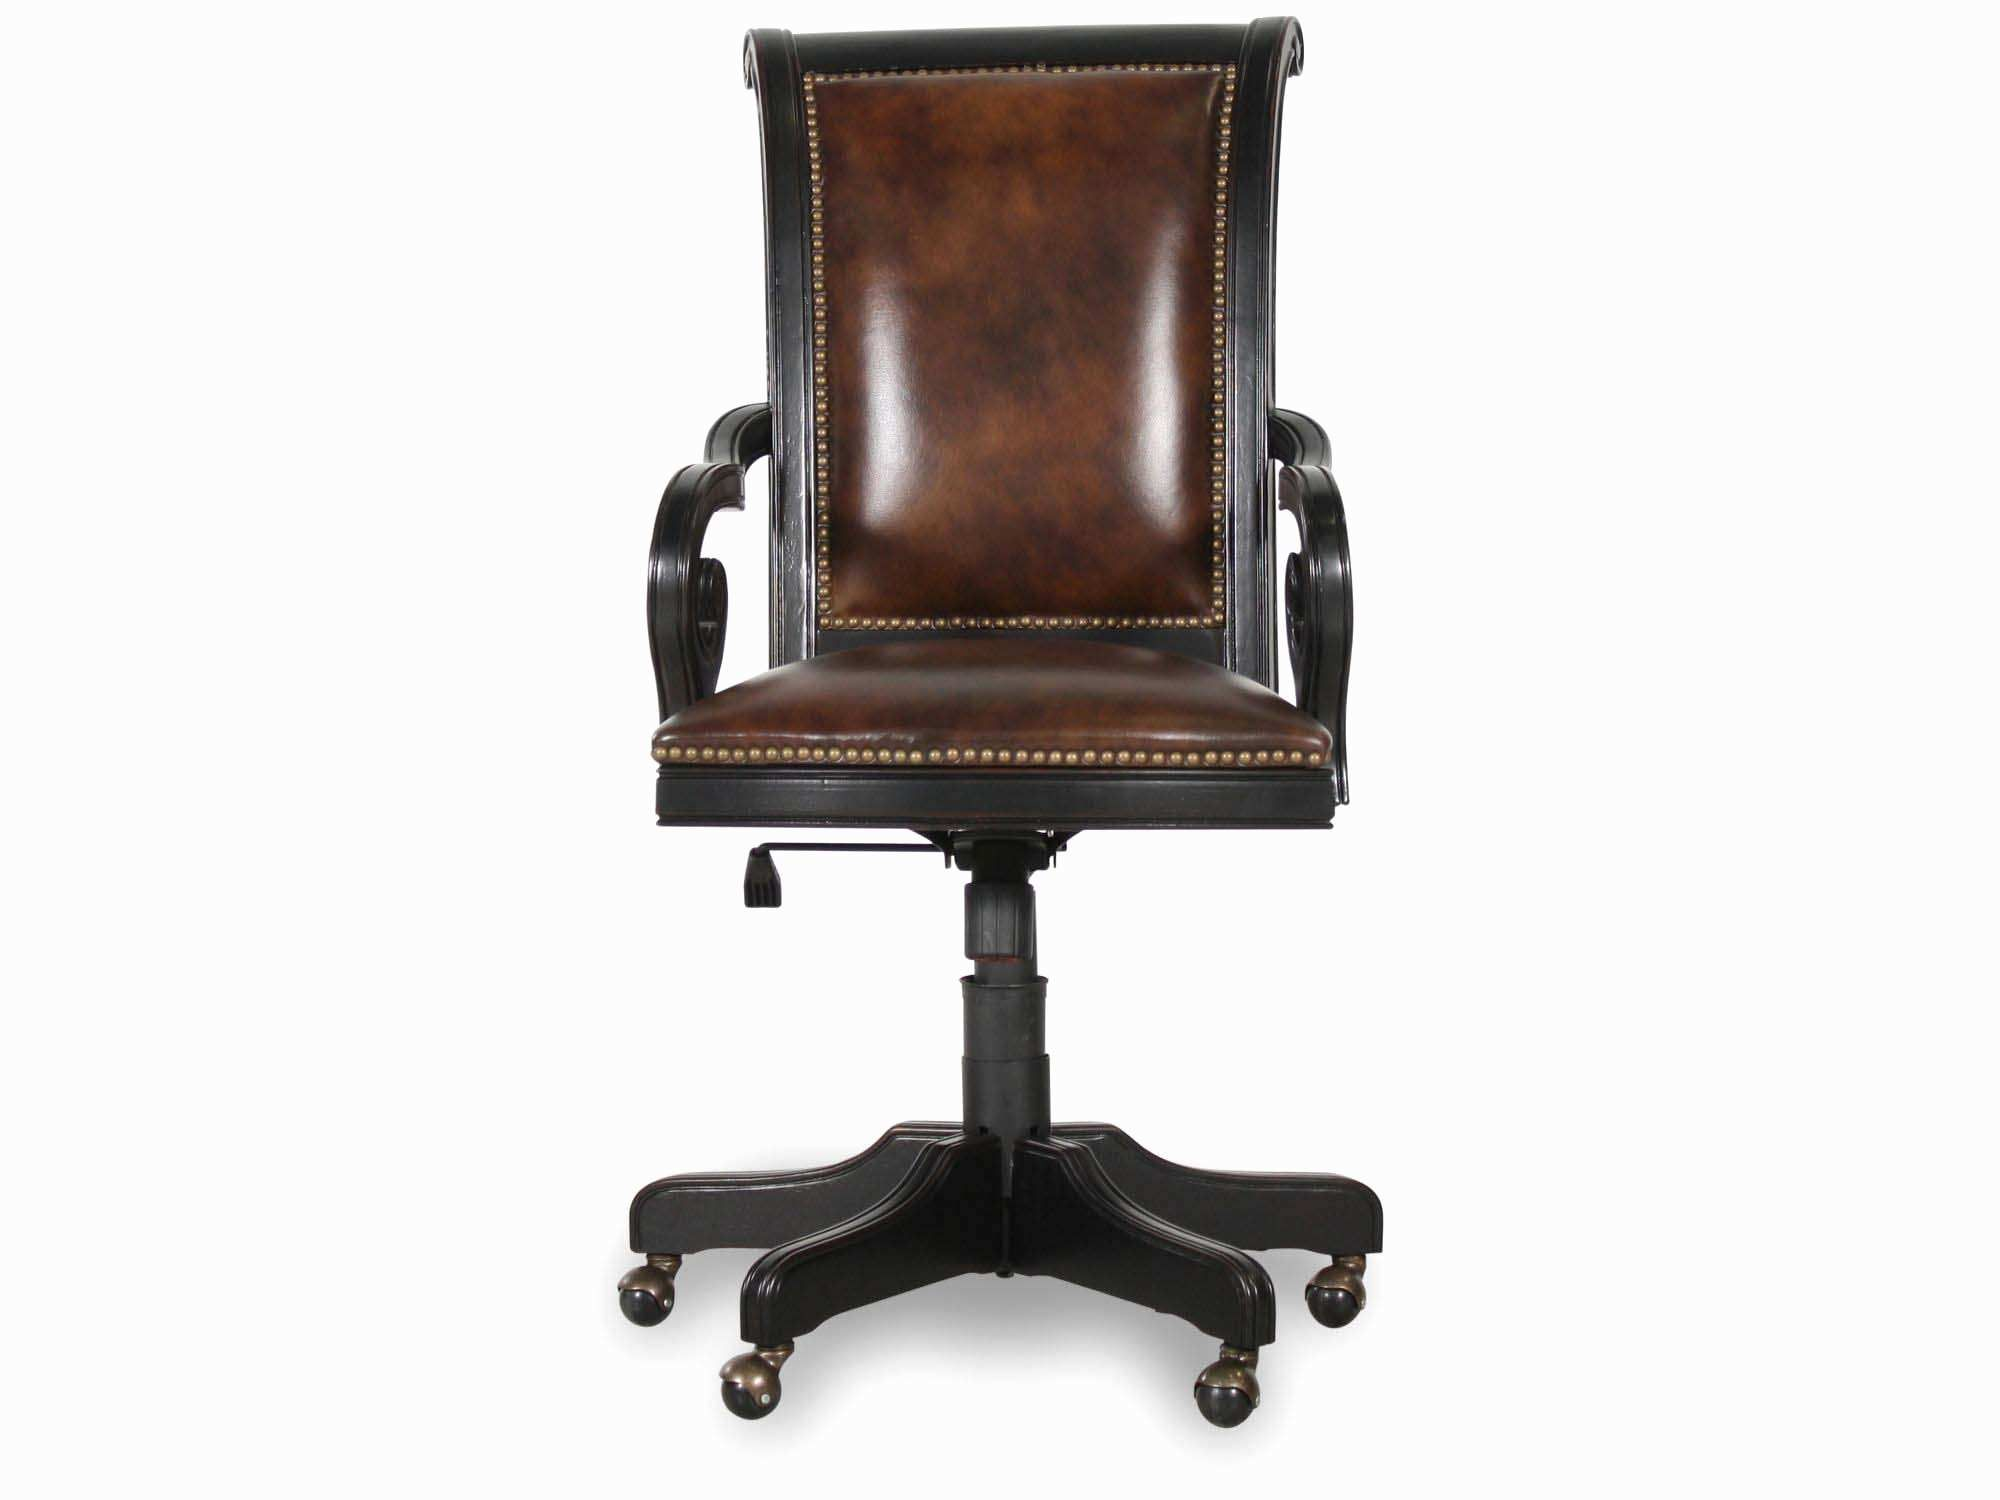 Strange Wooden Desk Chair Without Wheels Stuhle Stuhle Download Free Architecture Designs Scobabritishbridgeorg